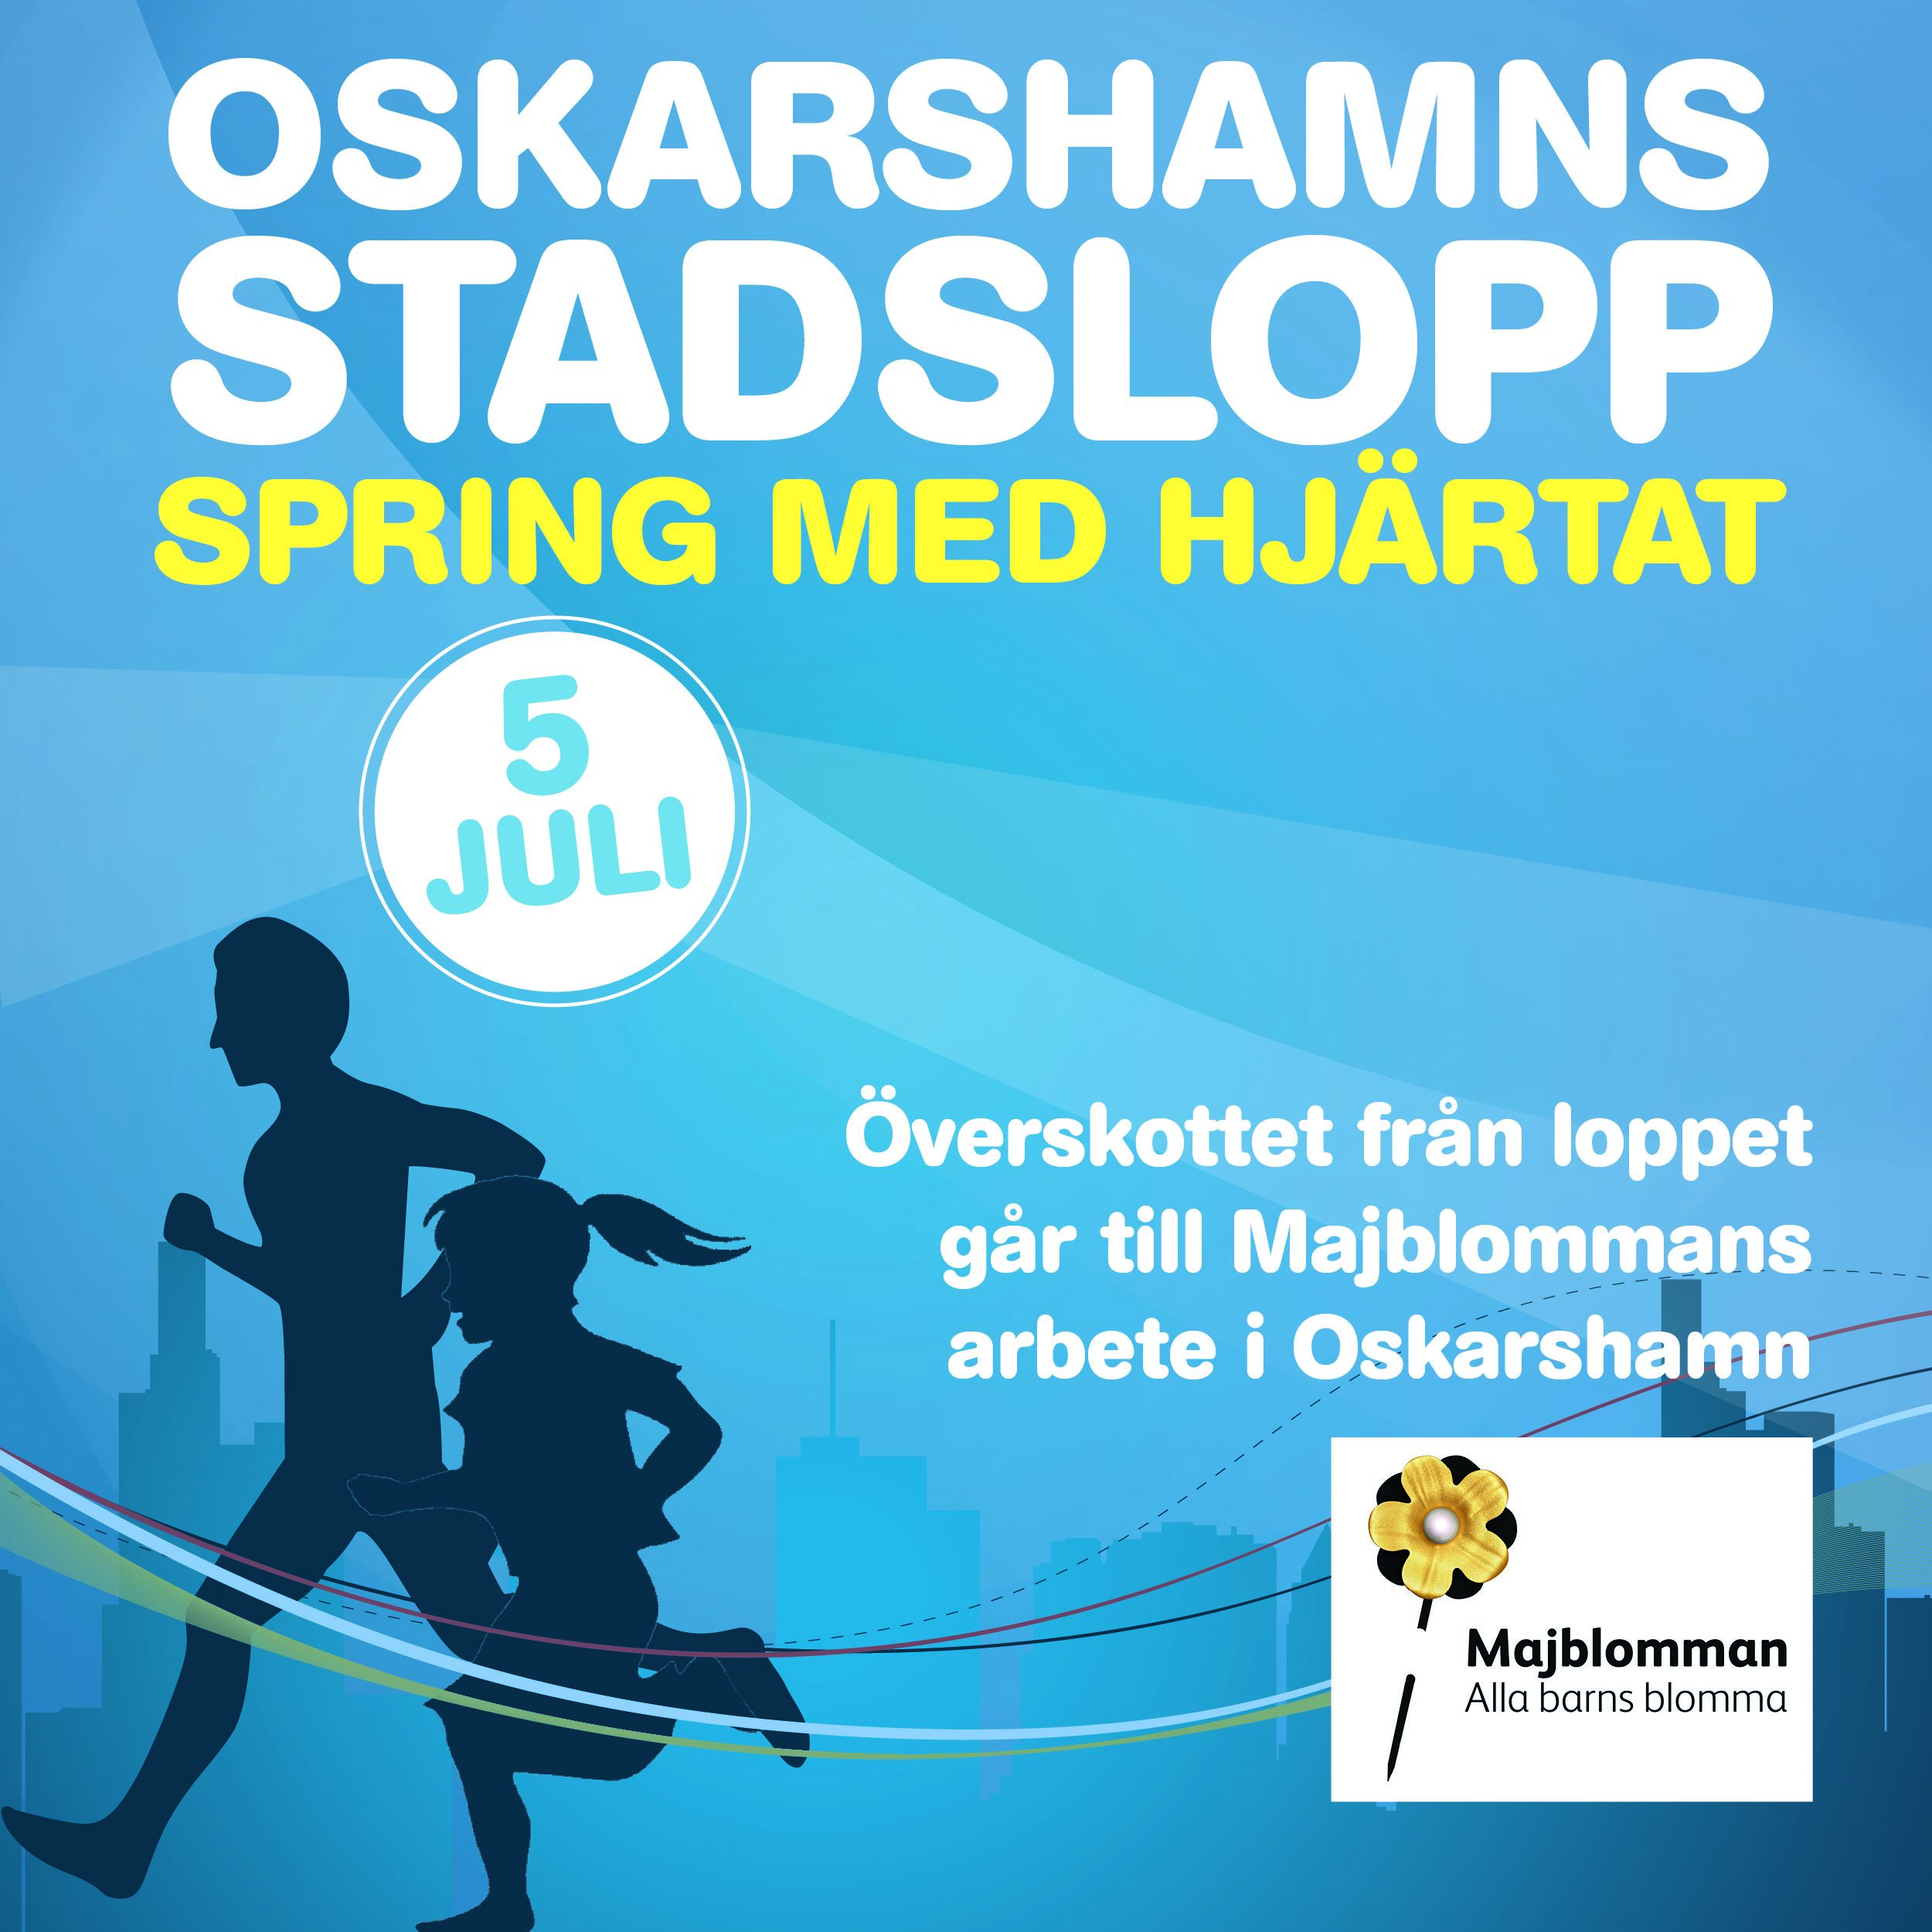 Oskarshamns Stadslopp 2018